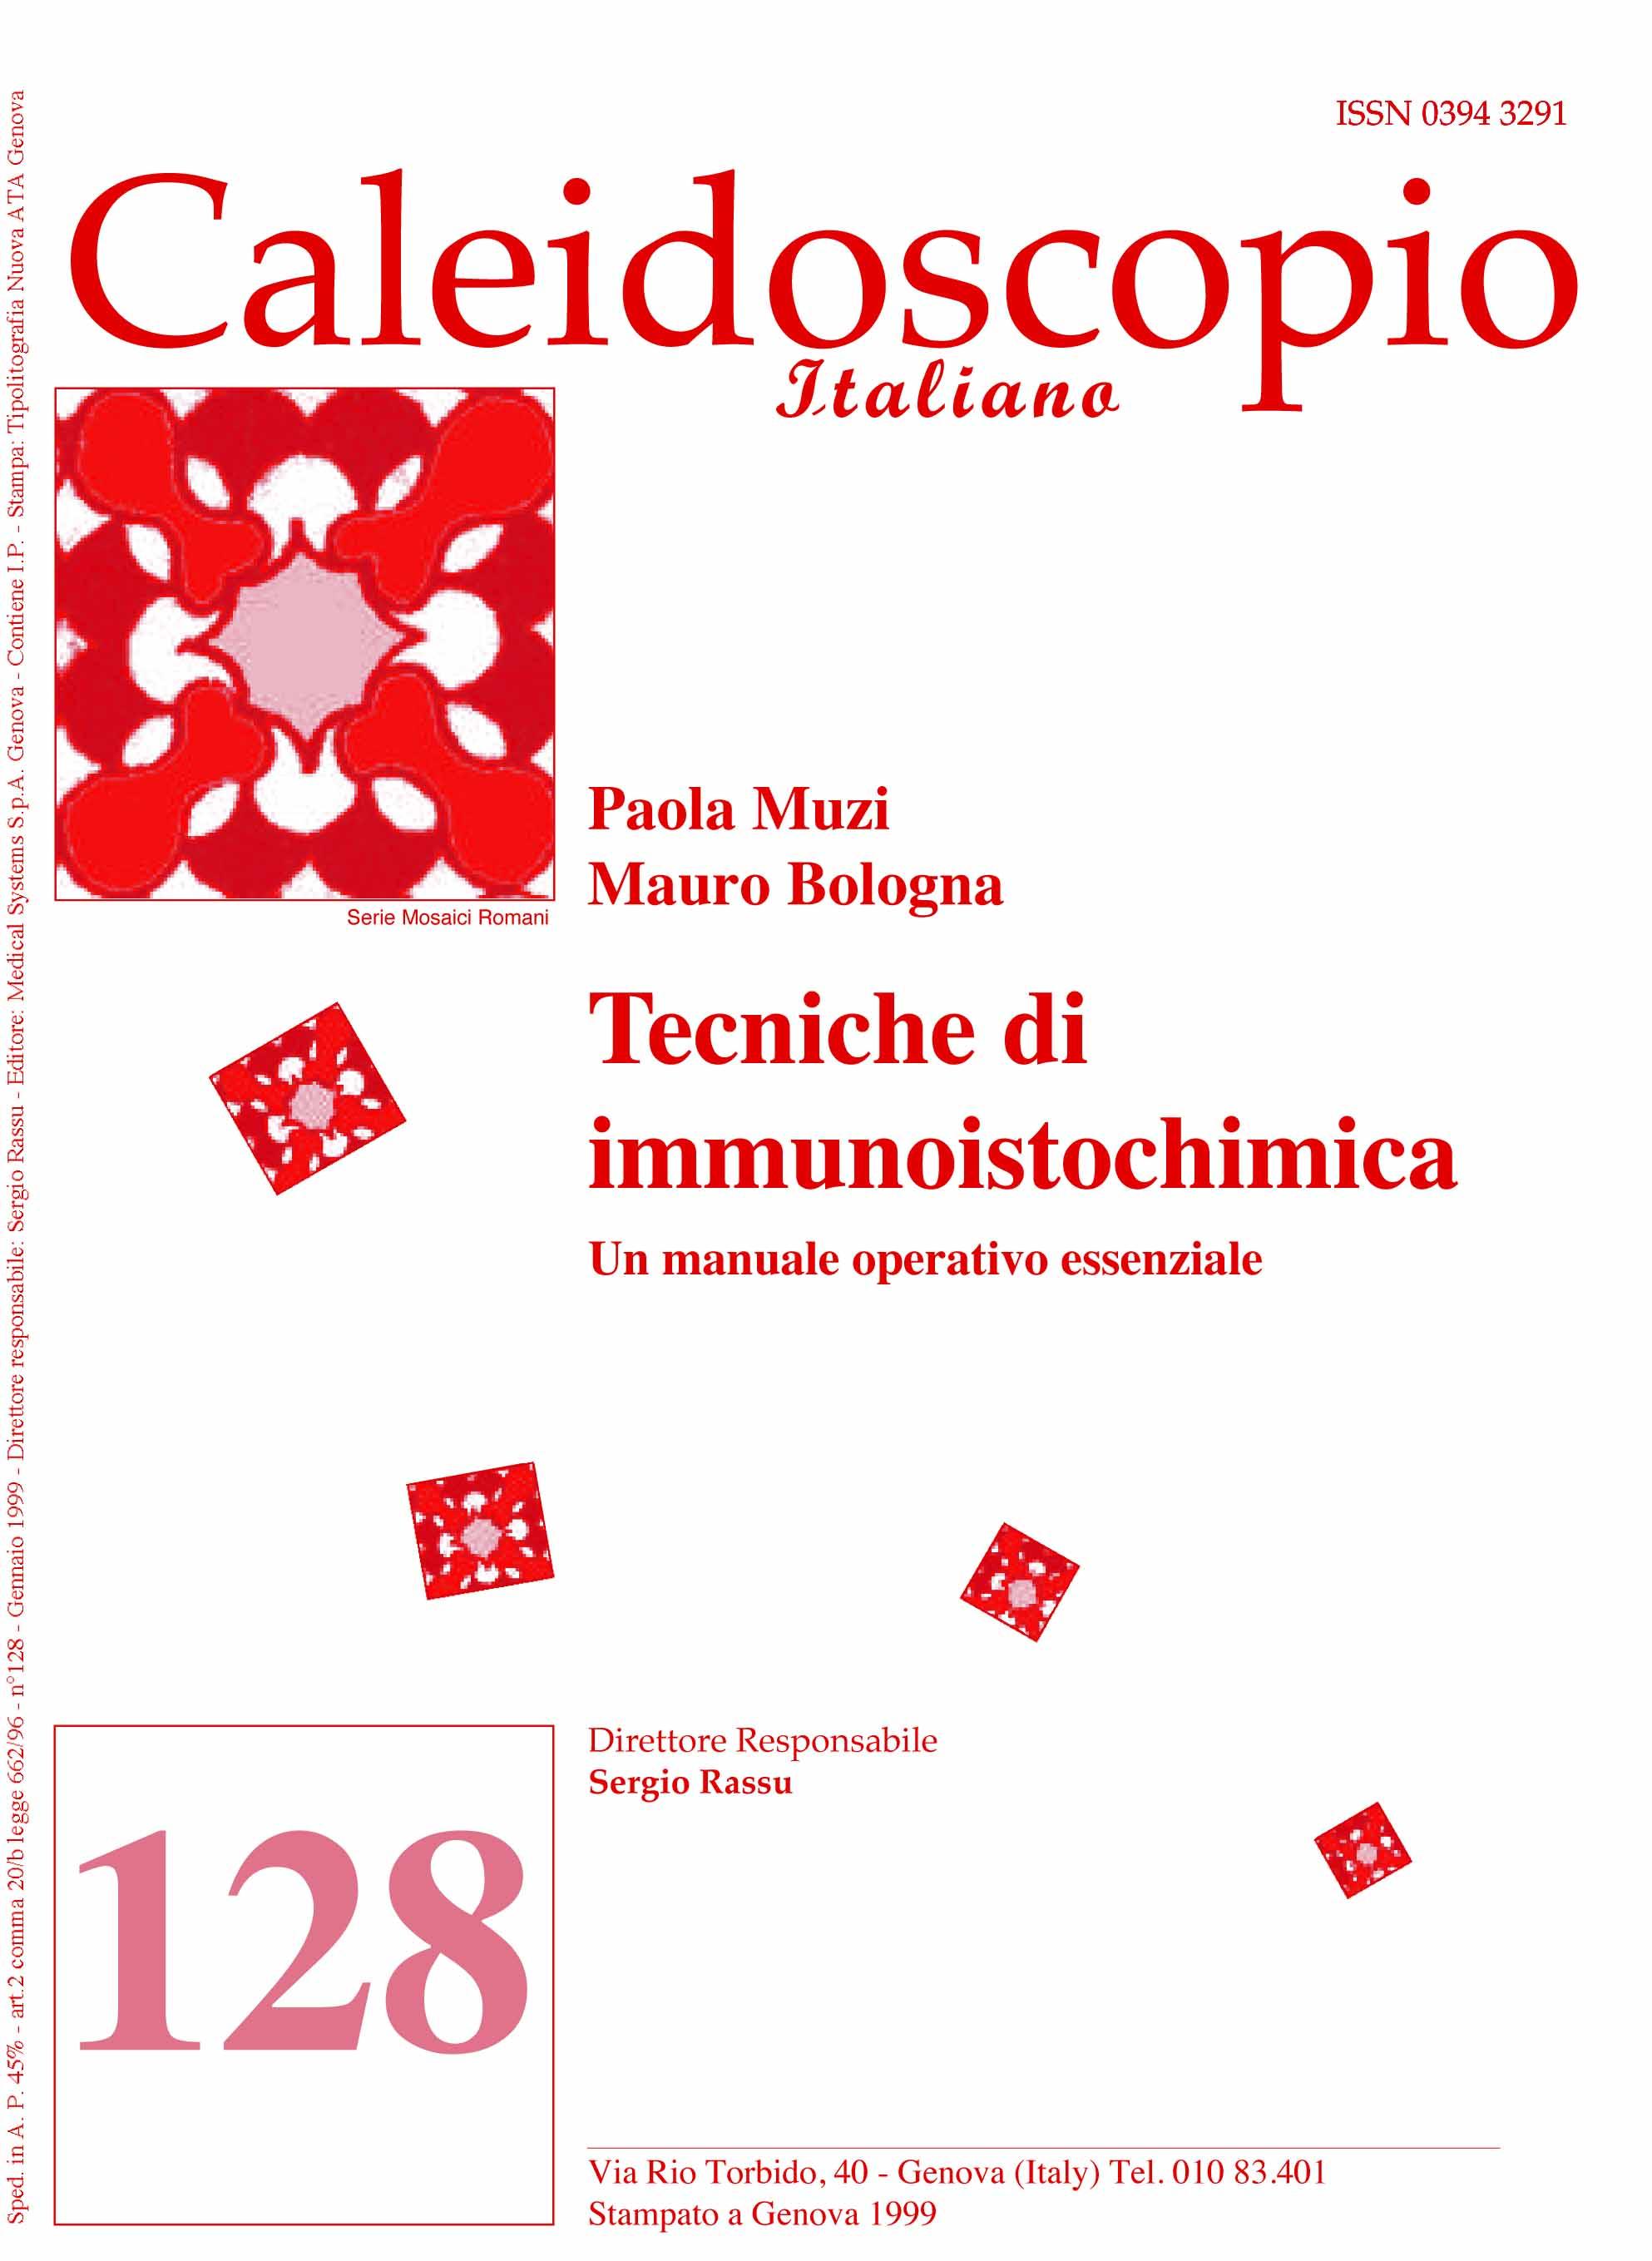 128_Tecniche_Immunoist_Copert